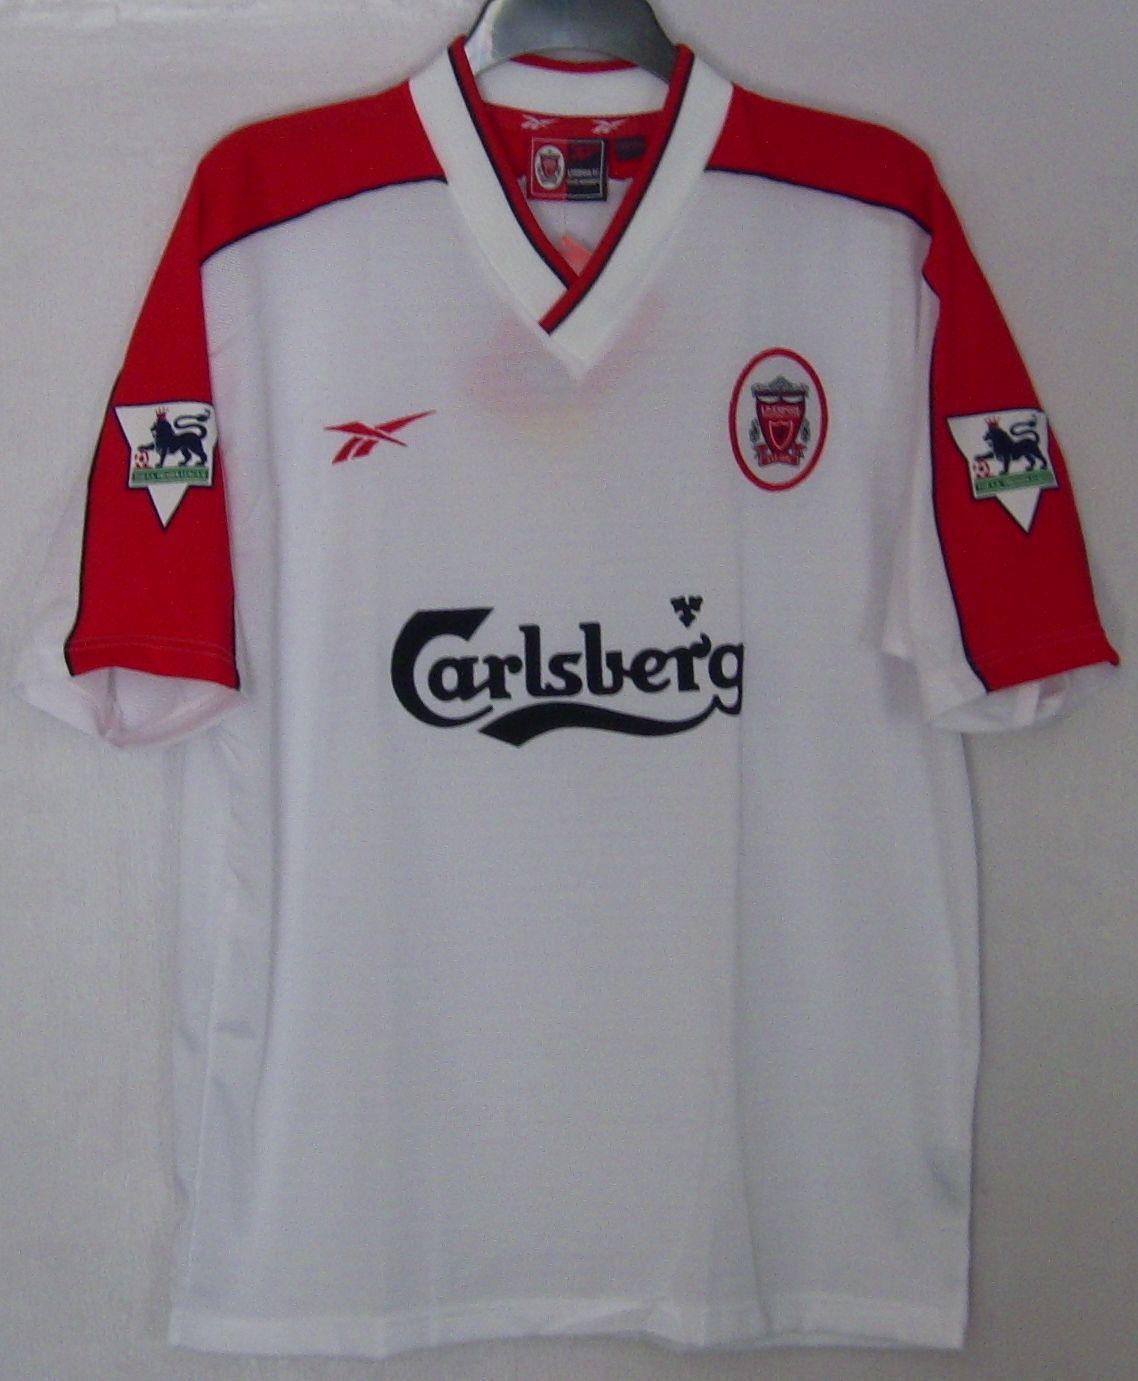 c87247960e3 Liverpool Away football shirt 1998 - 2000. Sponsored by Carlsberg